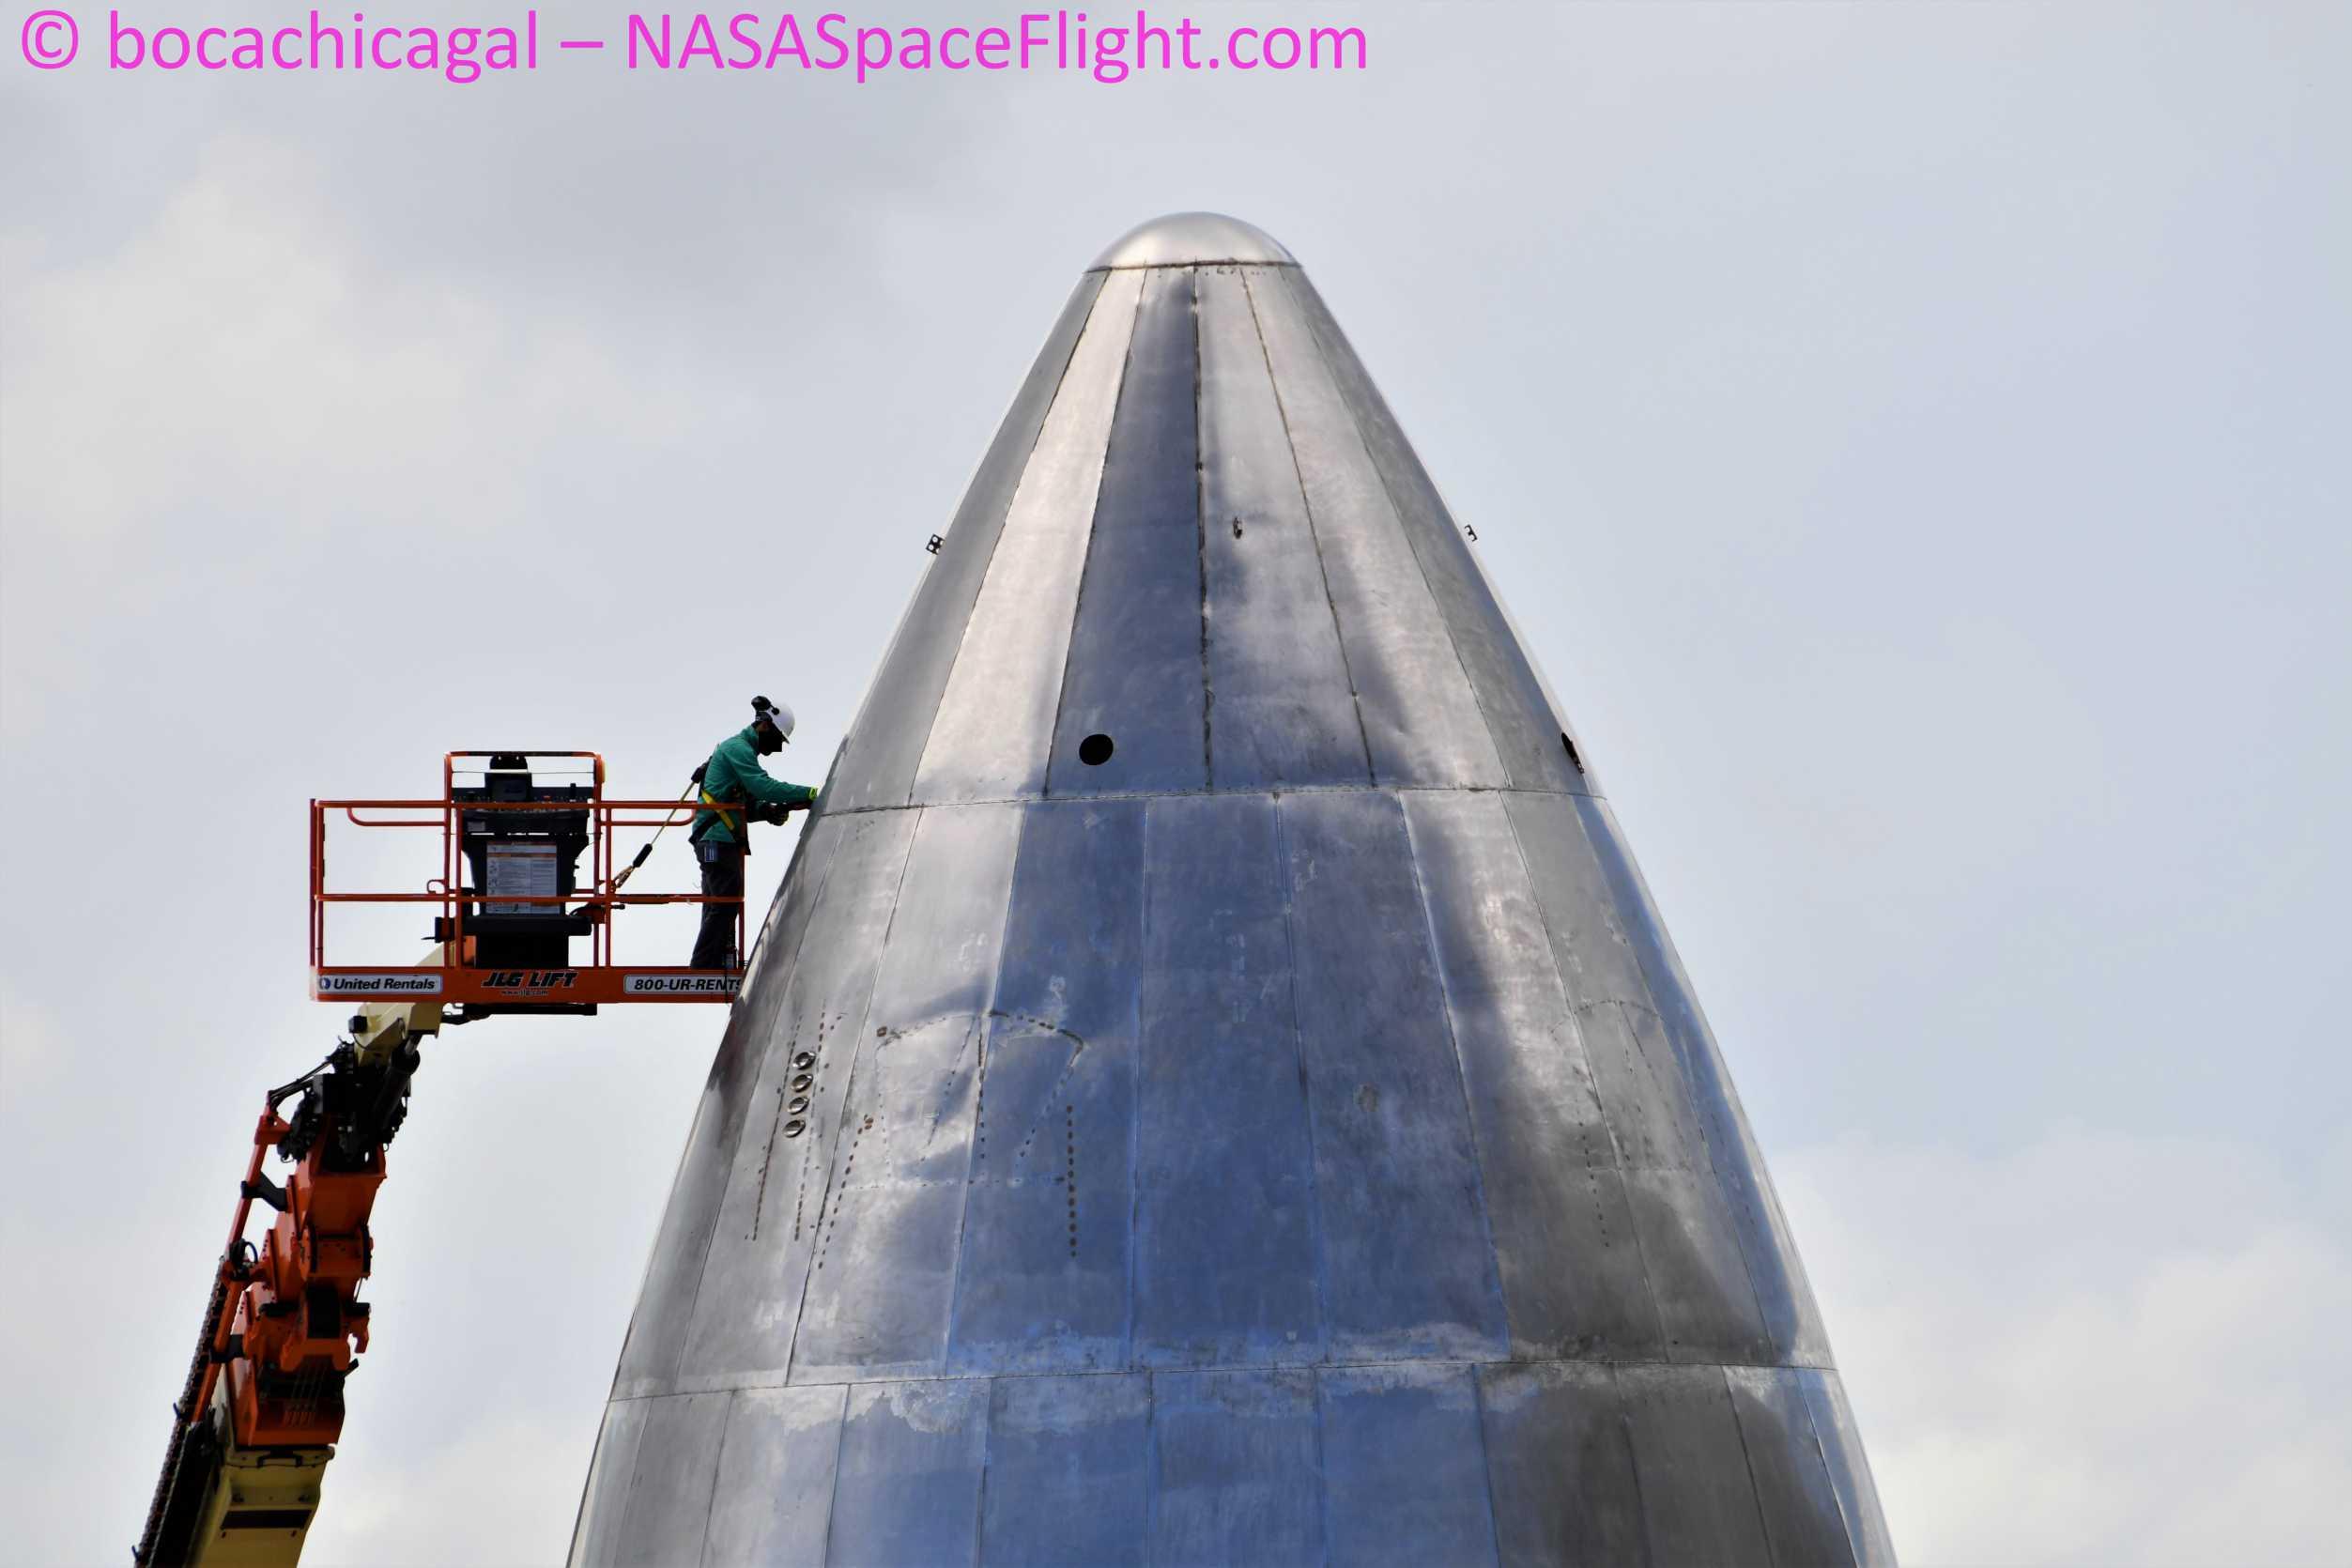 Starship Boca Chica 060120 (NASASpaceflight – bocachicagal) SN5 nose work 1 (c)